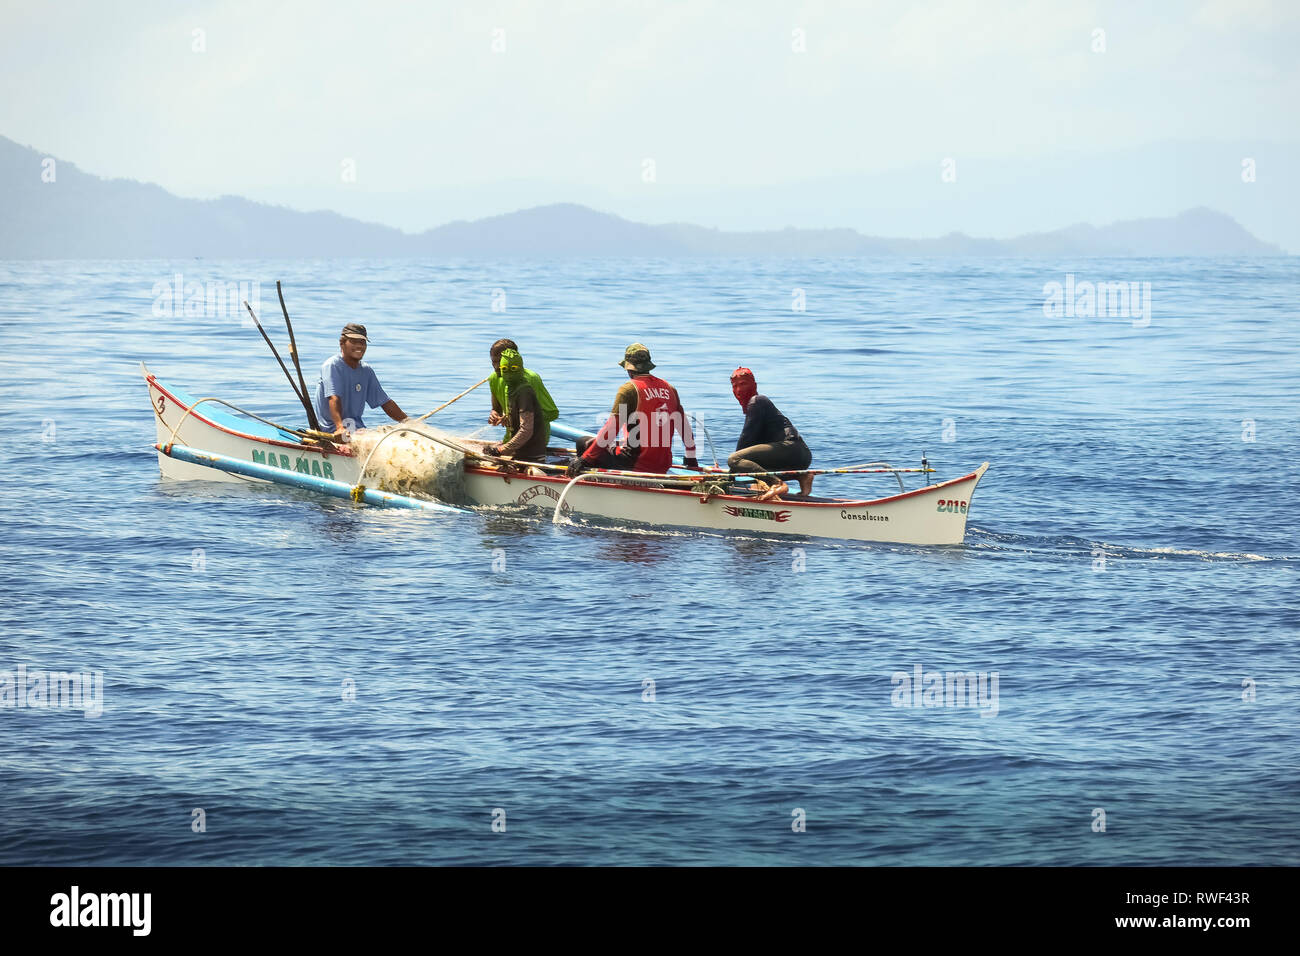 Filipino Fishermen Wearing Masks in Boat With Net - Siargao island, Philippines - Stock Image